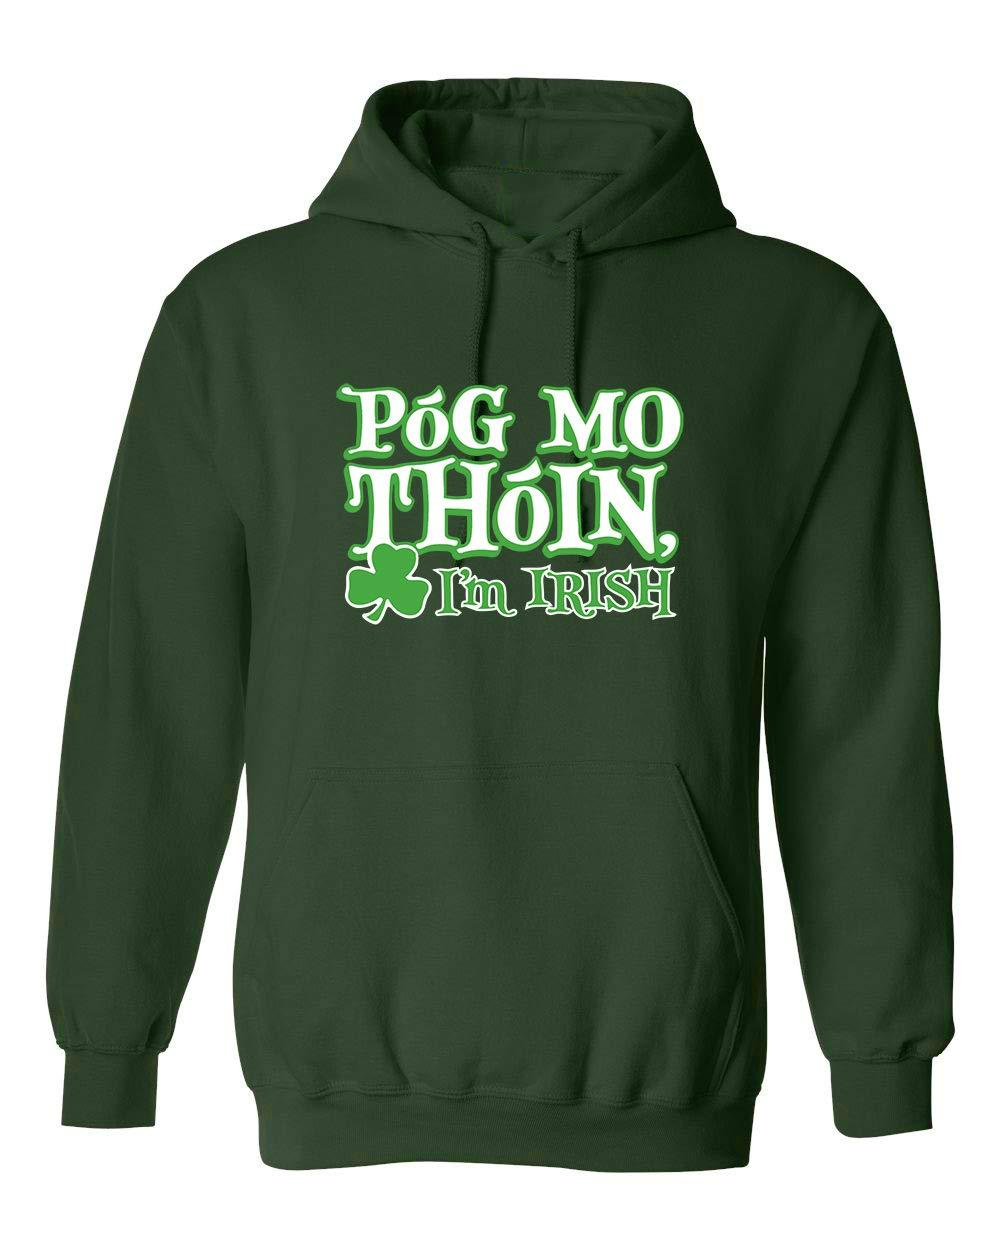 Pog Mo Thoin St Patrick S Day Saint Irish Pats Sarcastic Funny T Shirt